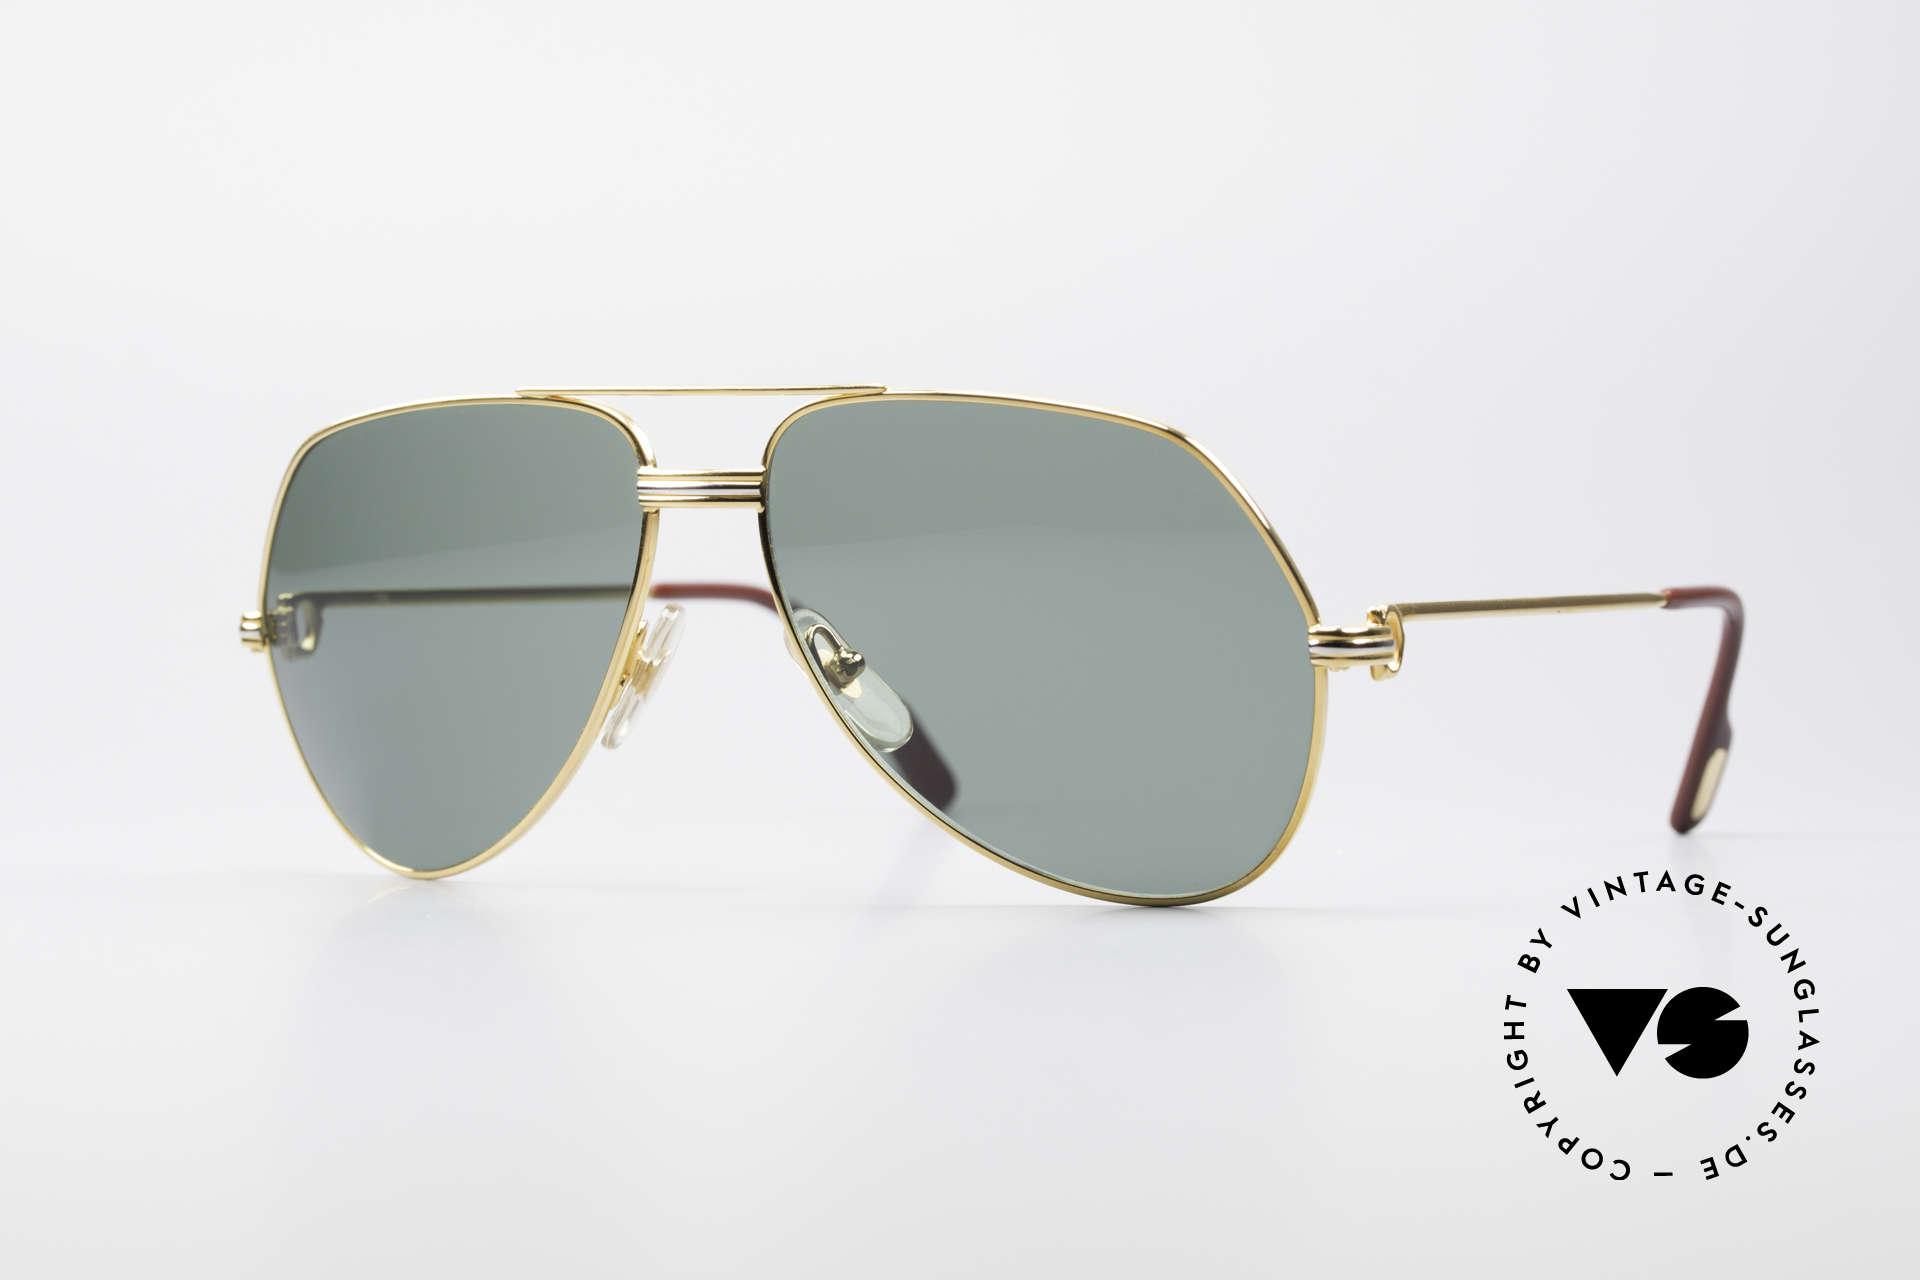 Cartier Vendome LC - M David Bowie Sunglasses, Vendome = the most famous eyewear design by CARTIER, Made for Men